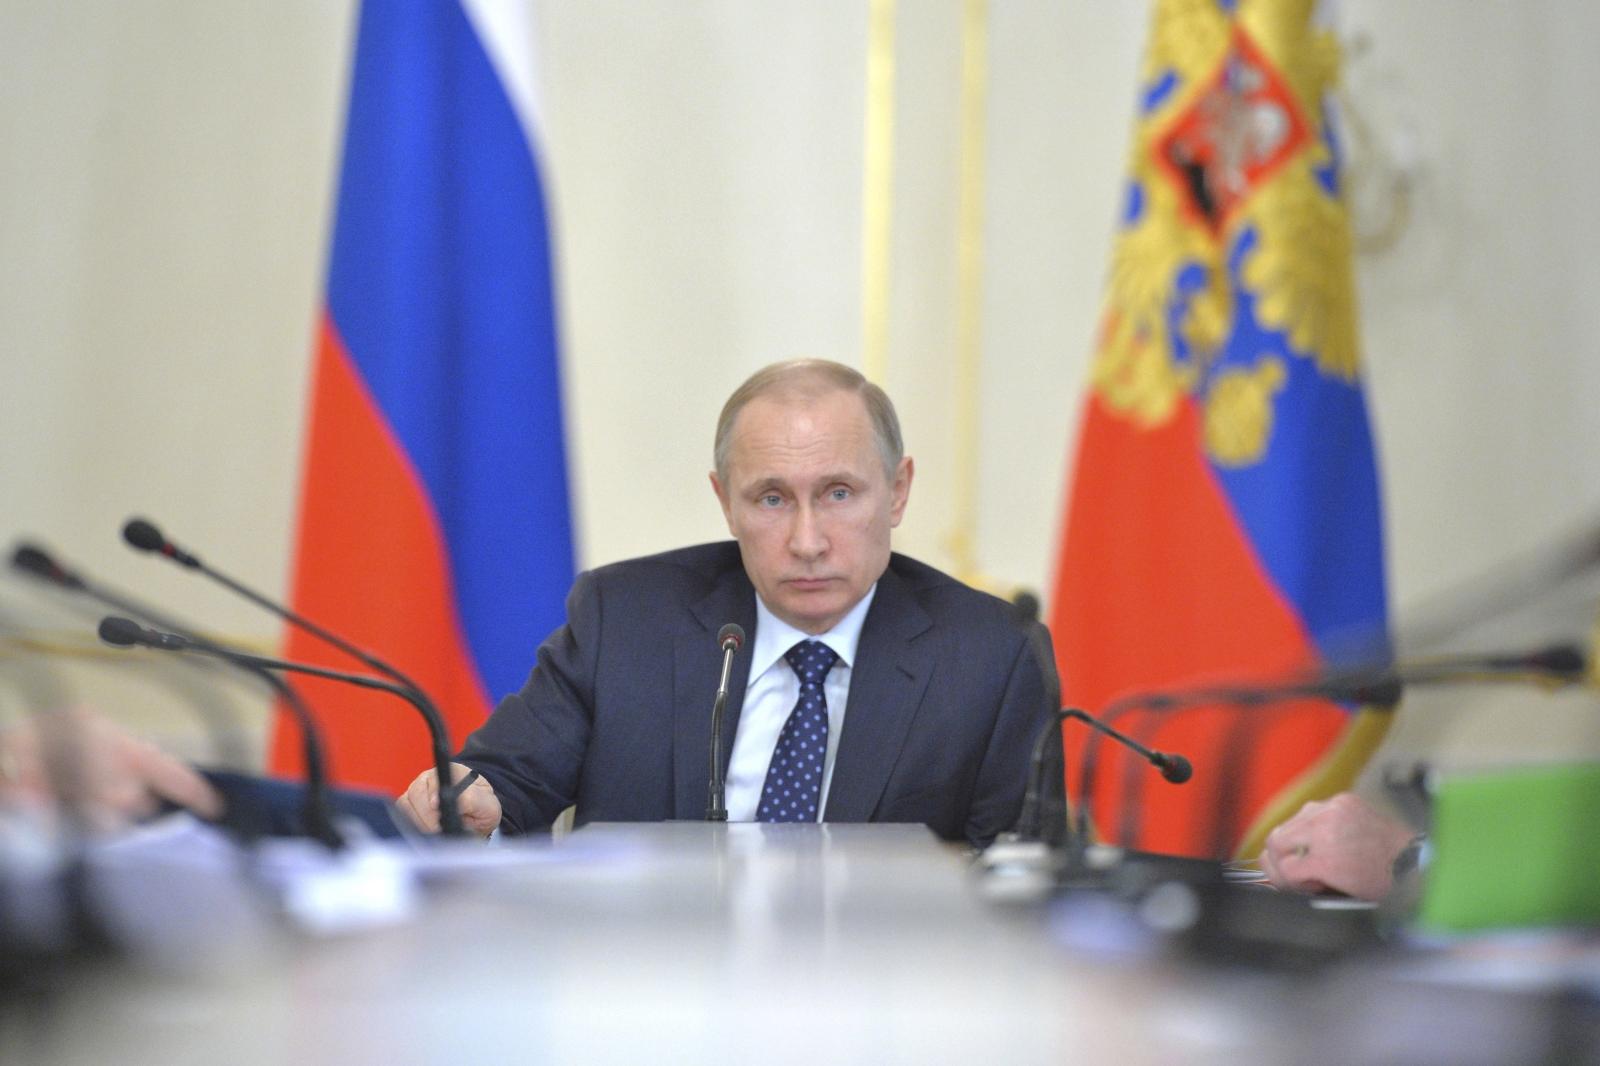 Vladimir Putin Nuclear